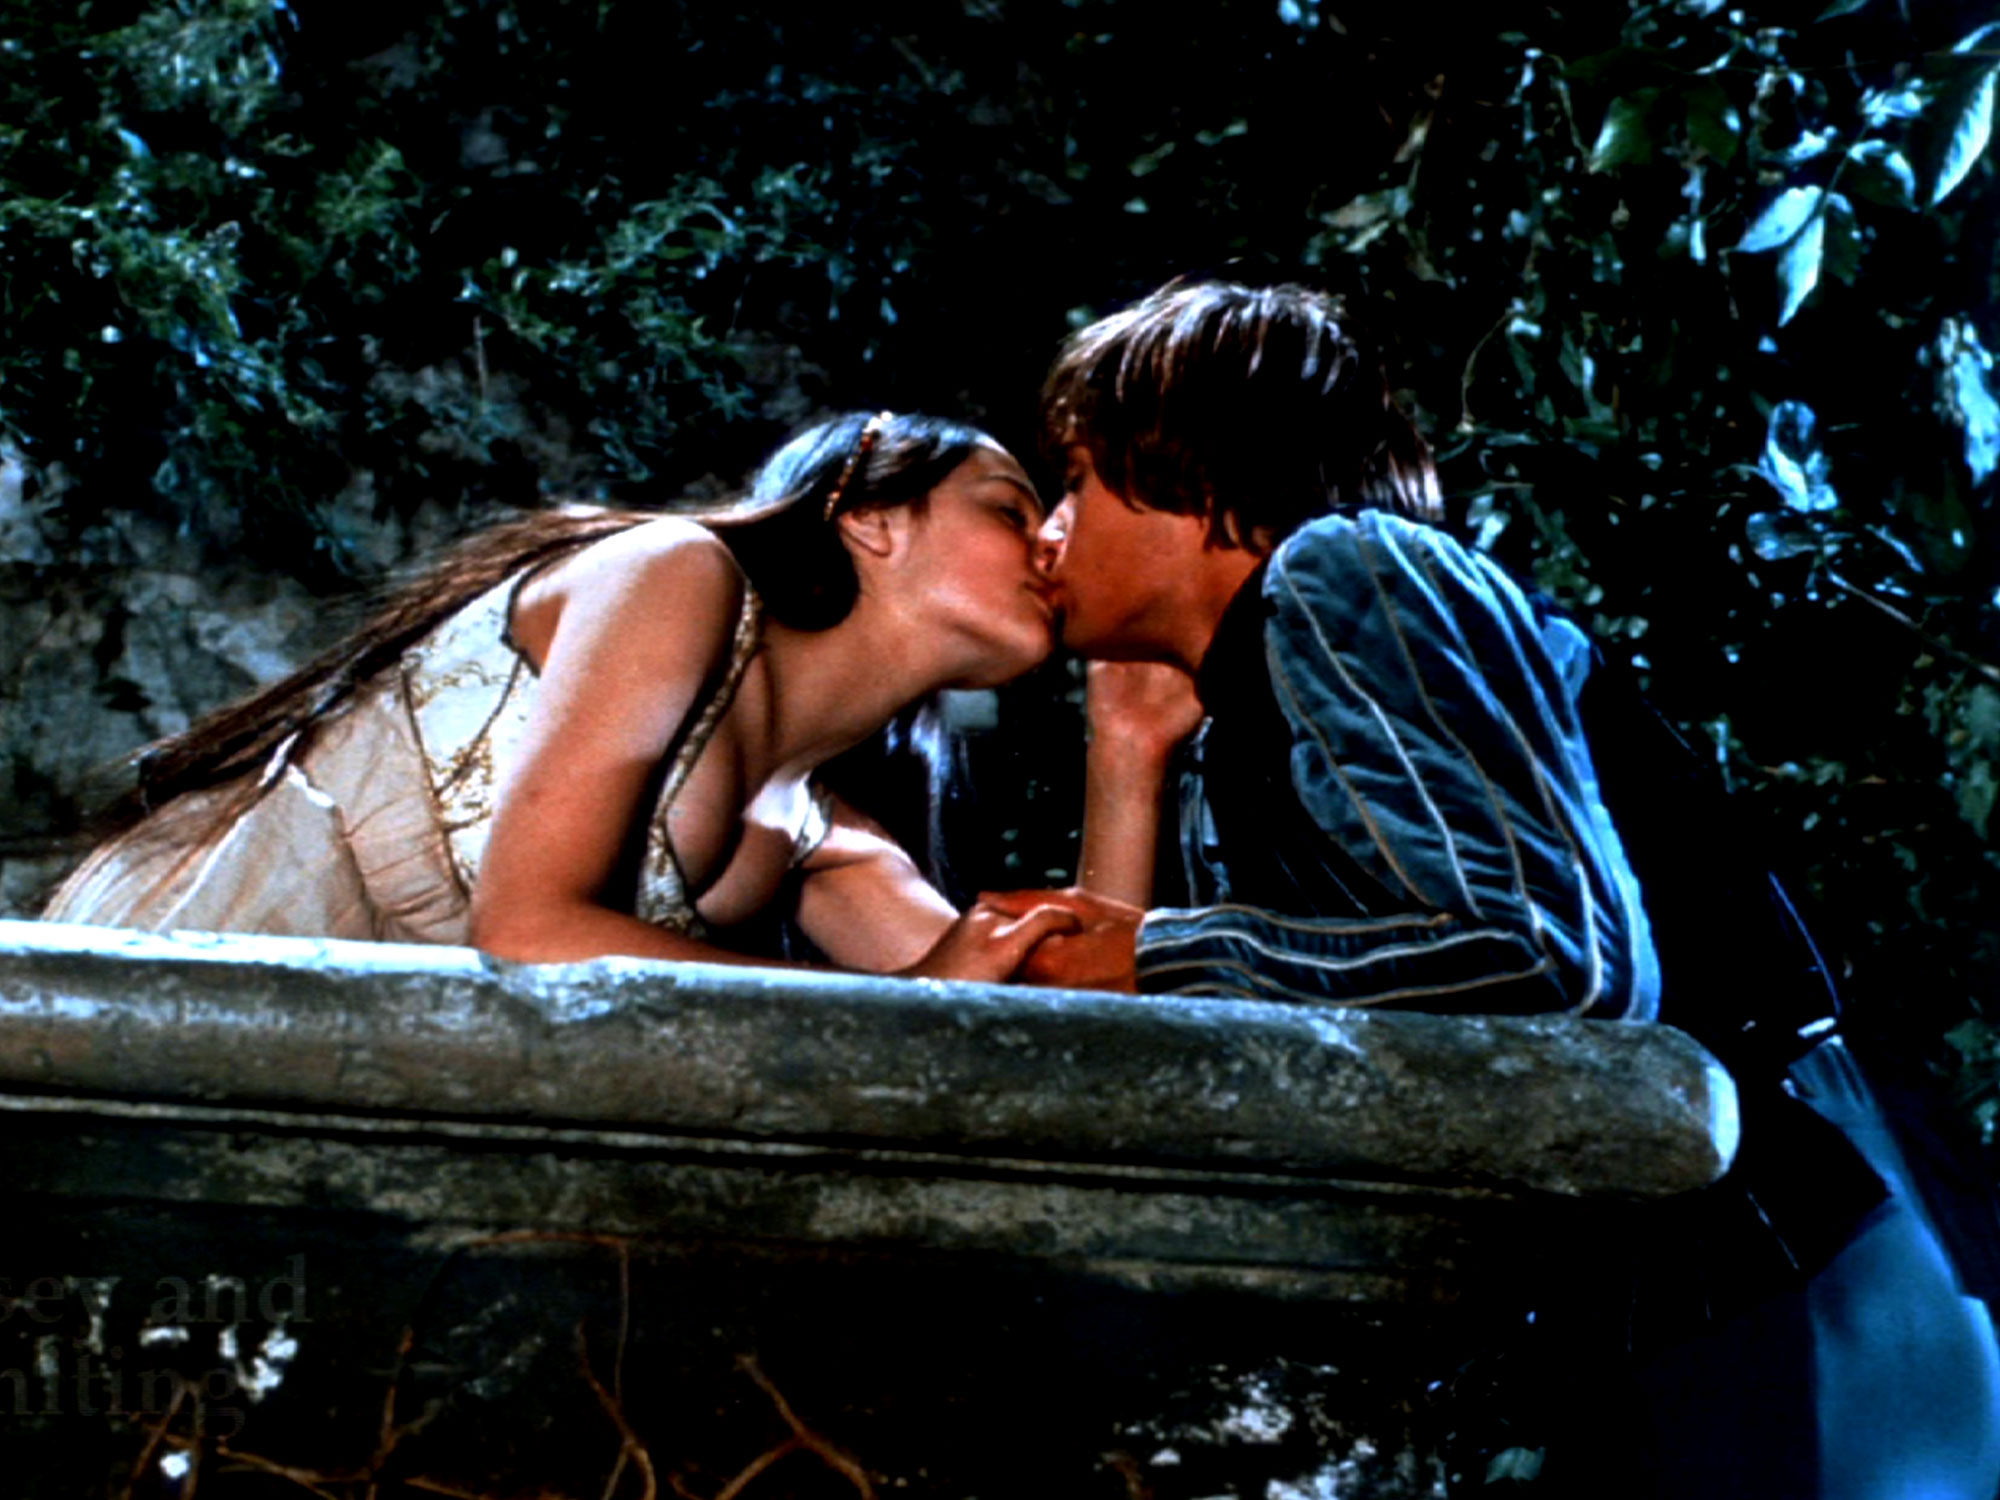 romeo and juliet 1968 and Romeo and juliet (1968) trailer   director: franco zeffirelli leonard whiting, olivia hussey, john mcenery, milo o'shea.